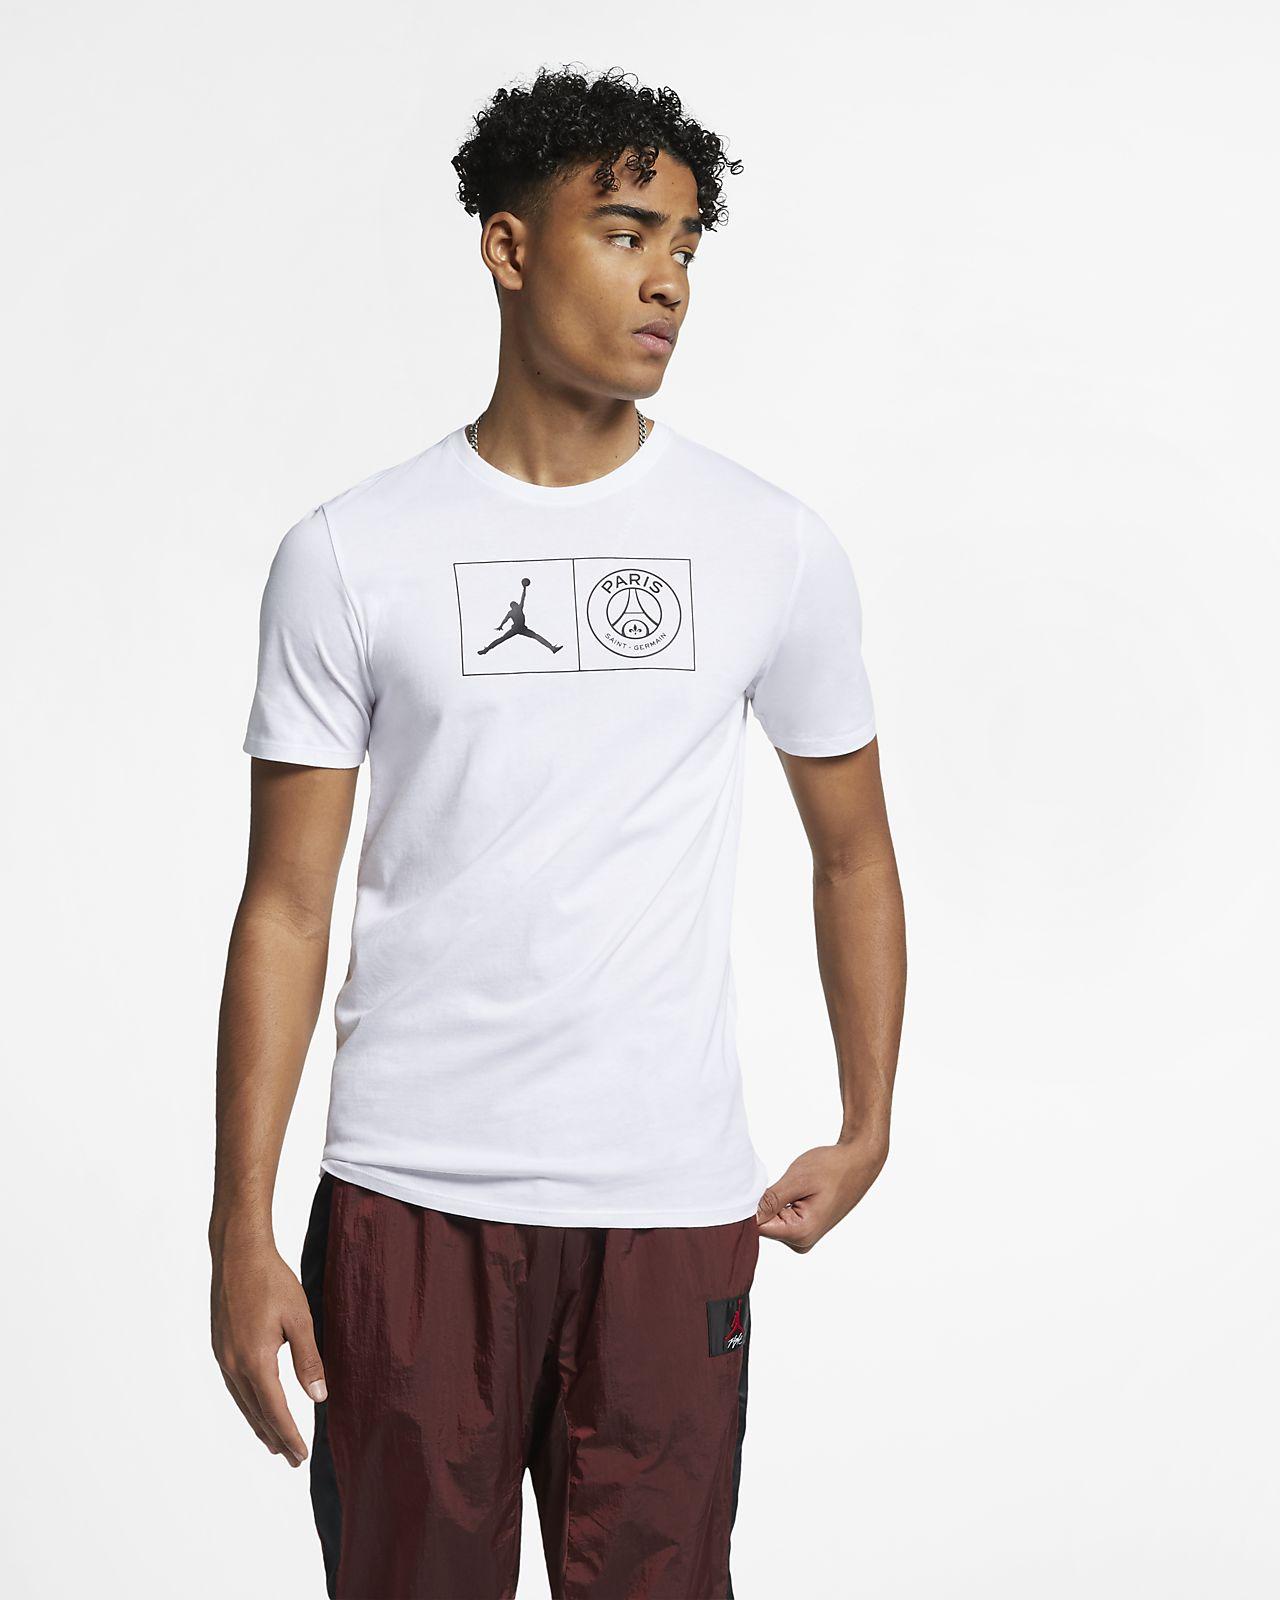 PSG Herren-T-Shirt